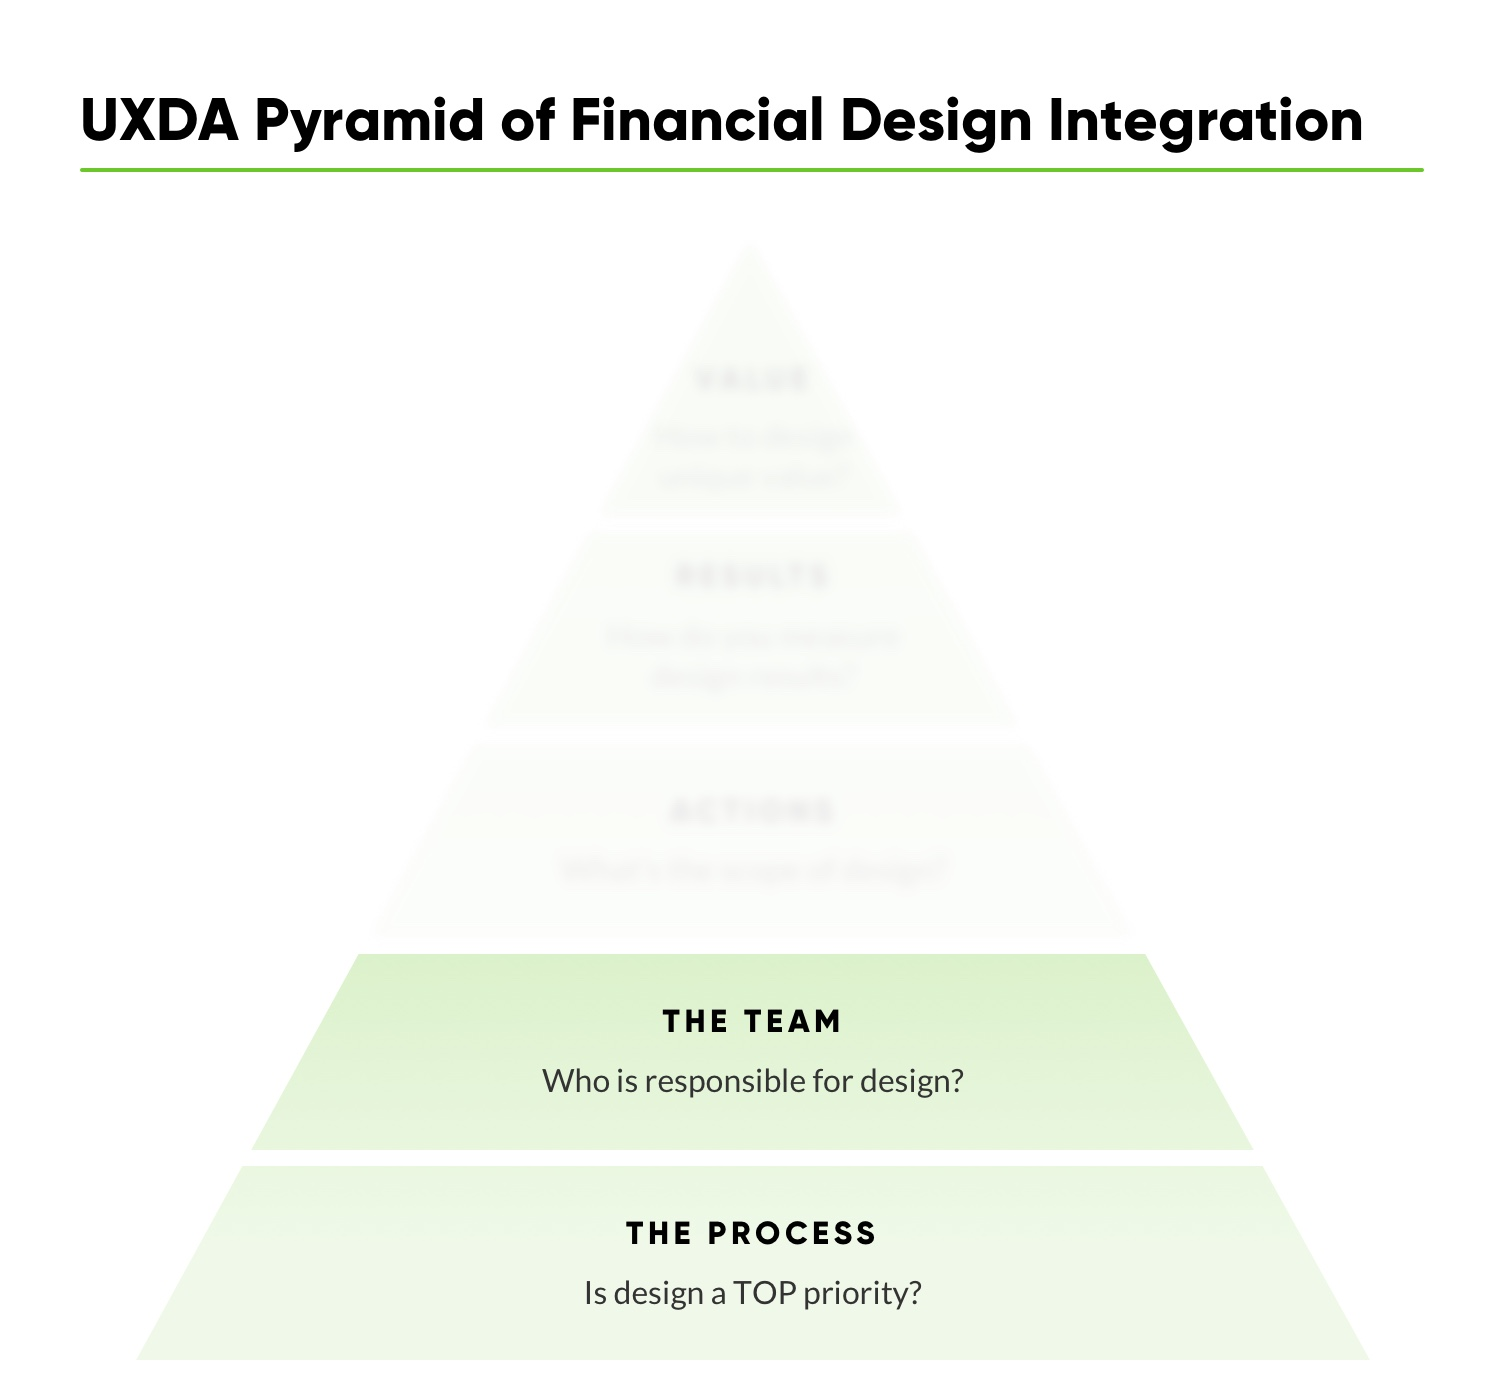 financial-ux-design-methodology-uxda-financial-design-integration-2-S.jpg